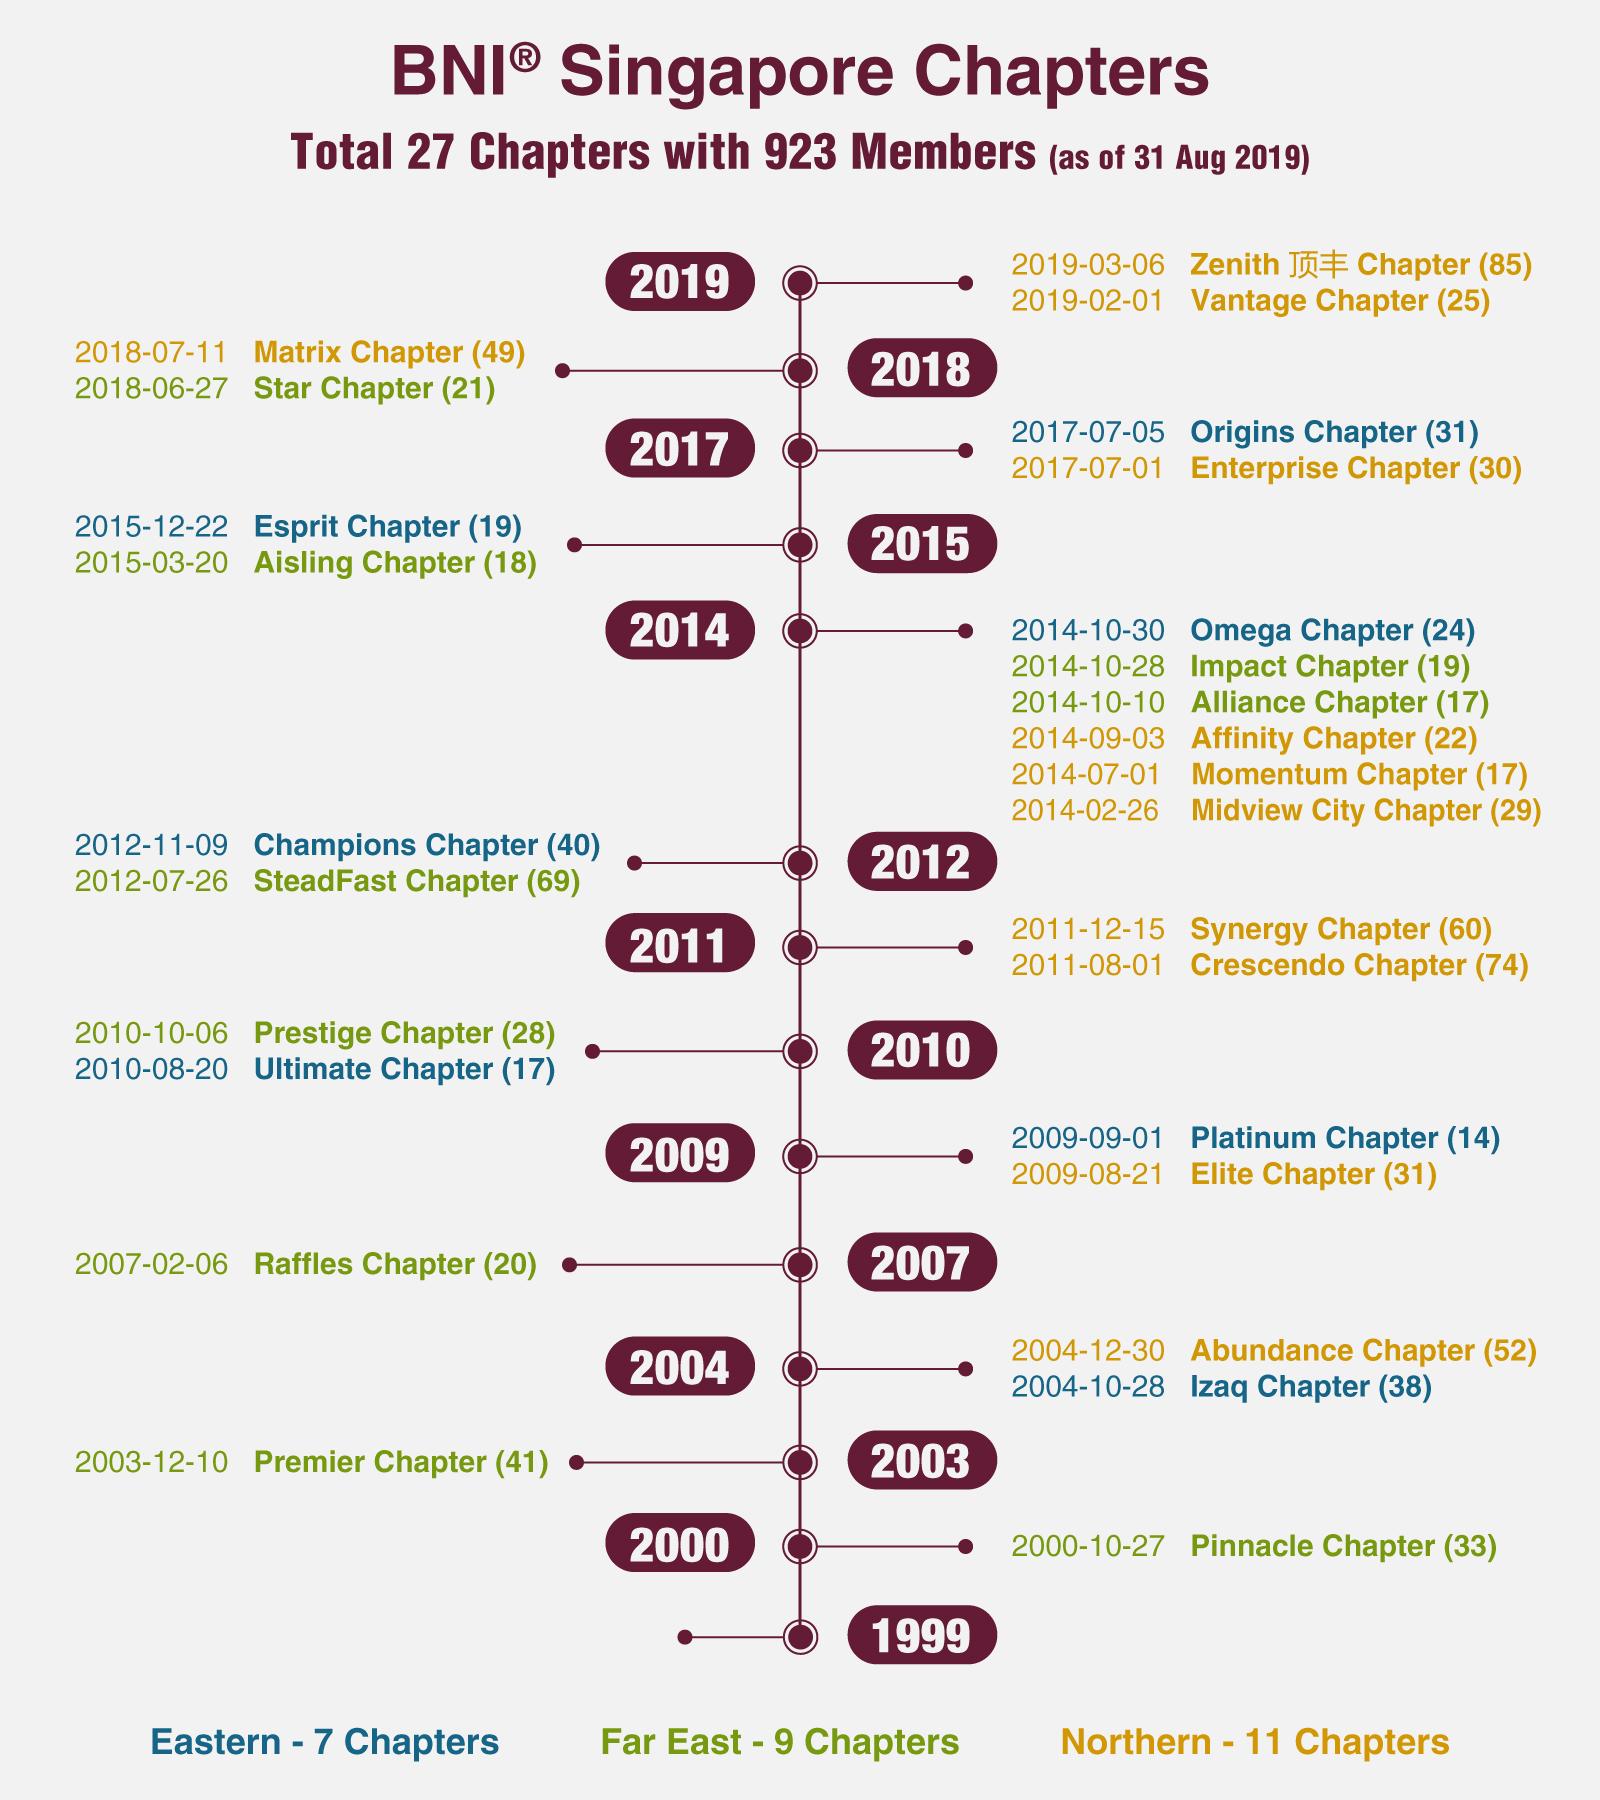 BNI-SG_27-Chapters_1600x1600.jpg